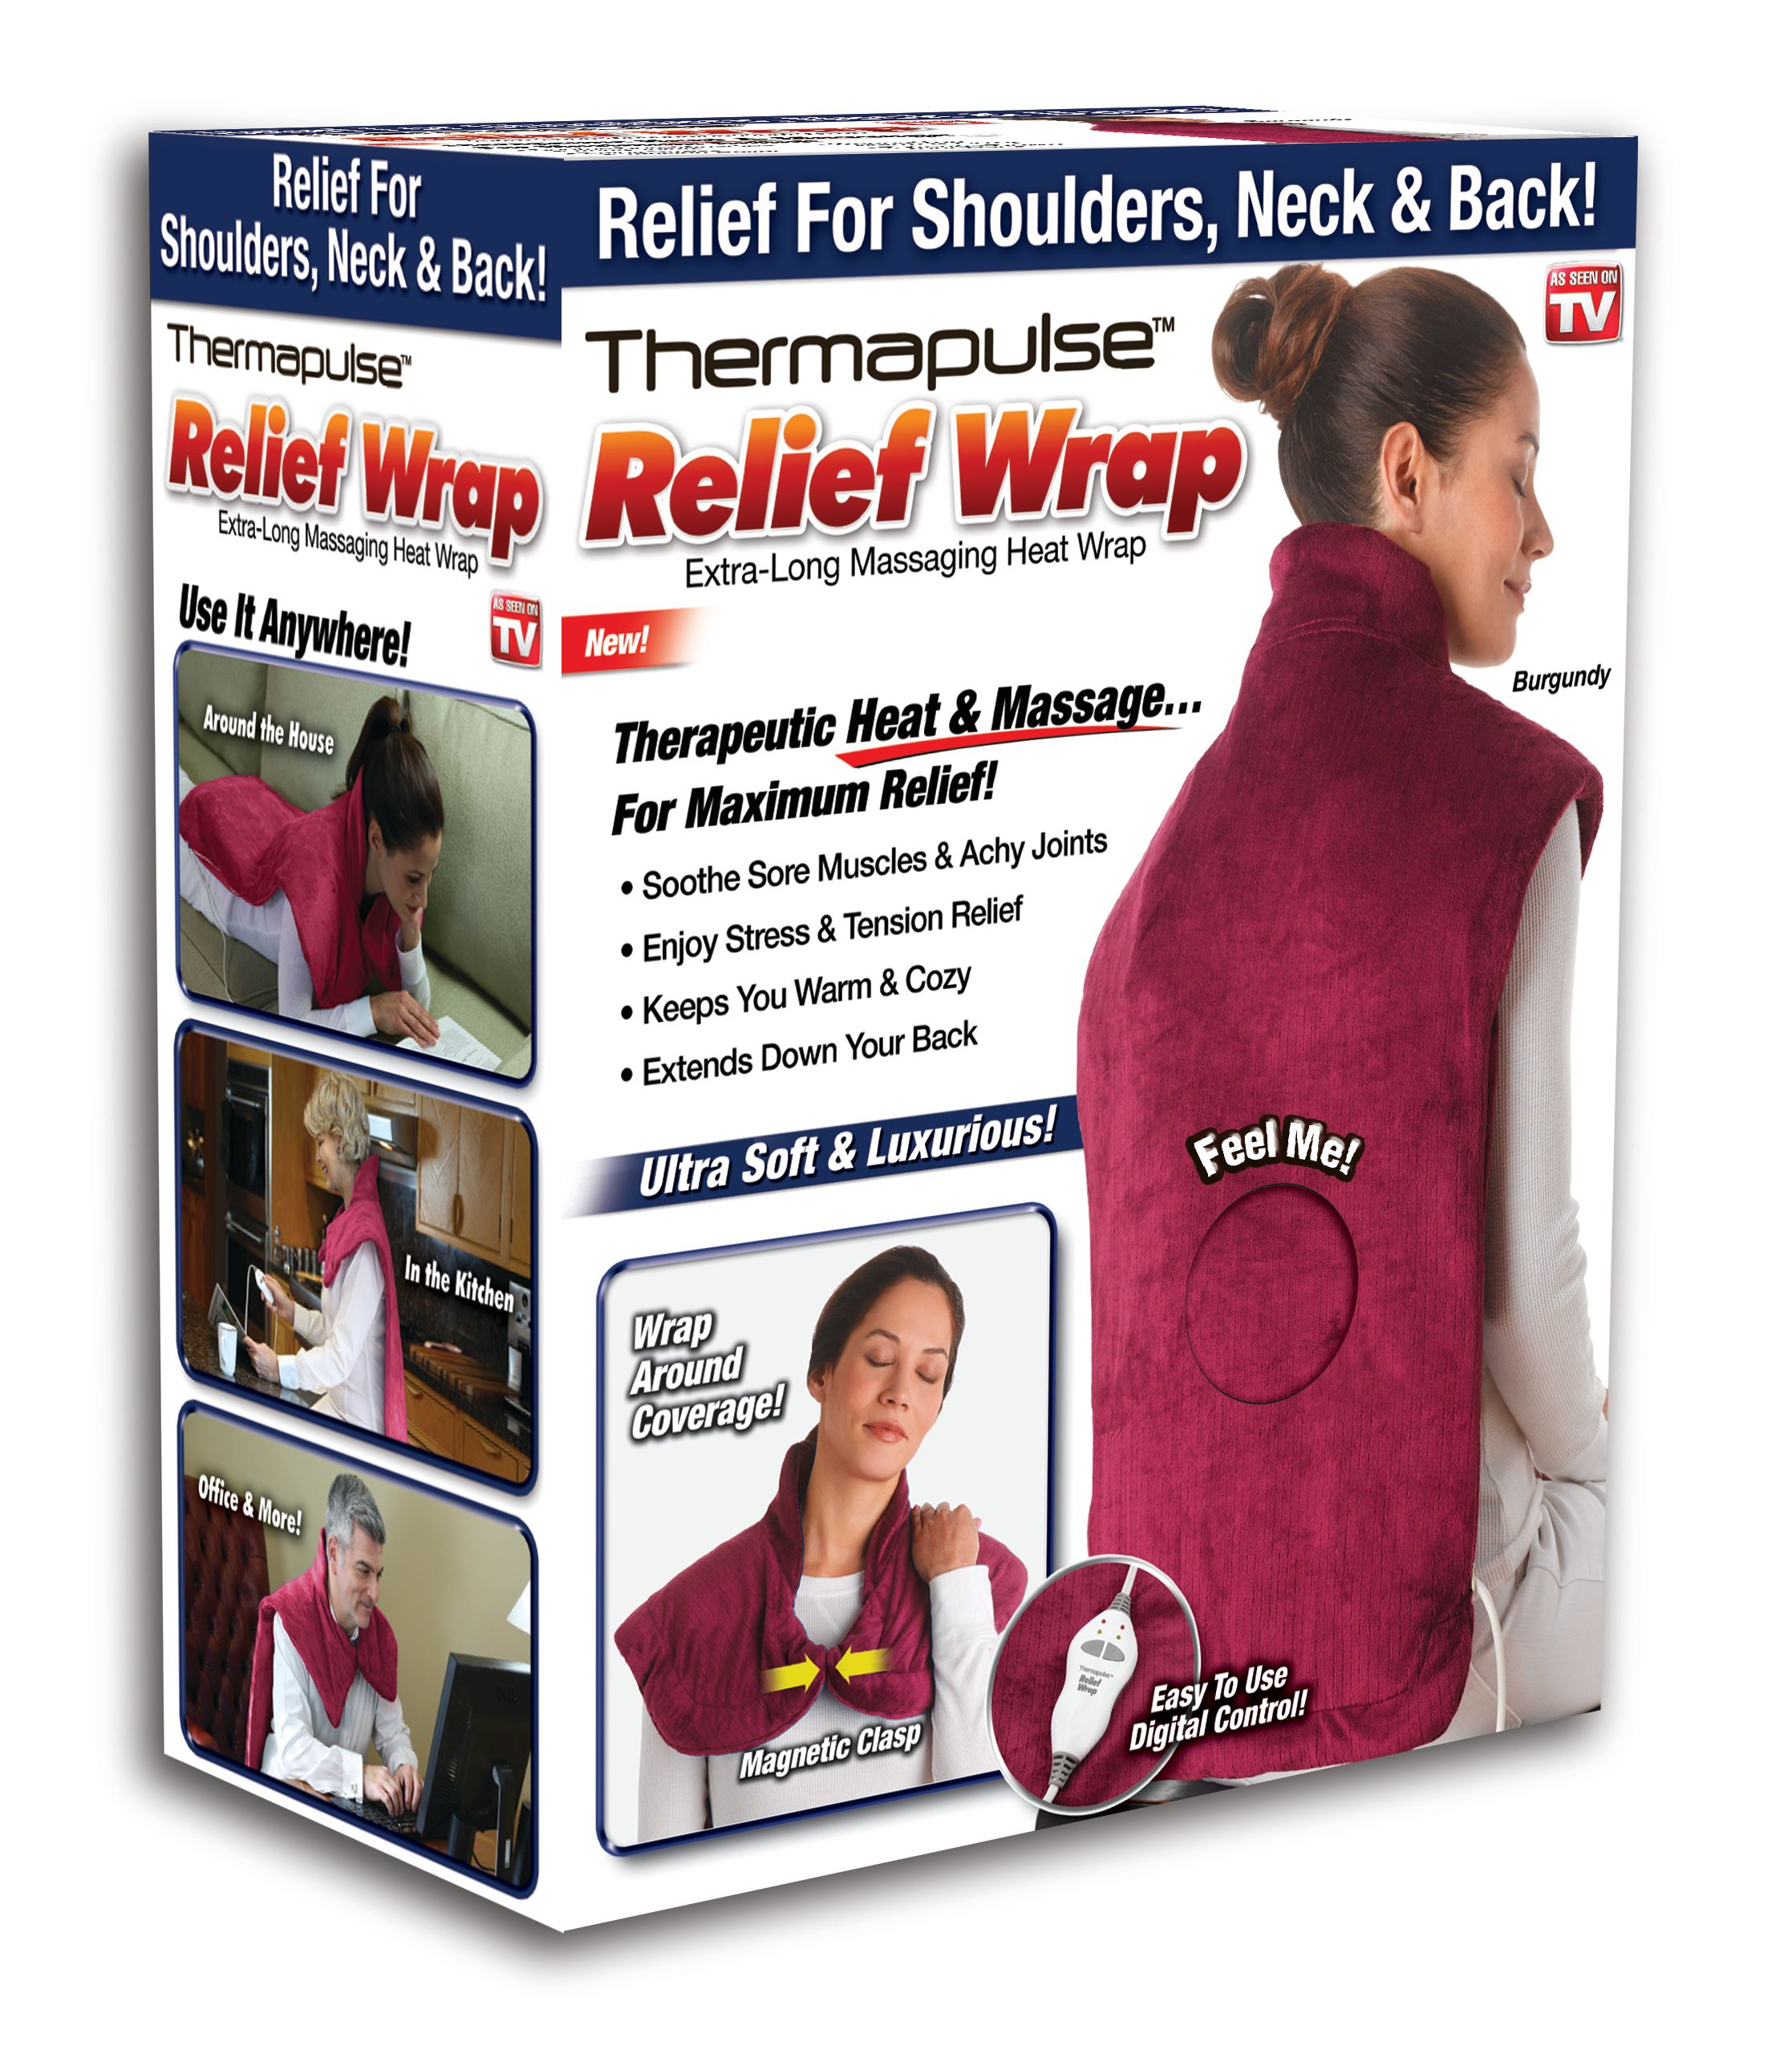 Relief Wrap Heat Therapy Wrap Burgandy As Seen On Tv Walmartcom